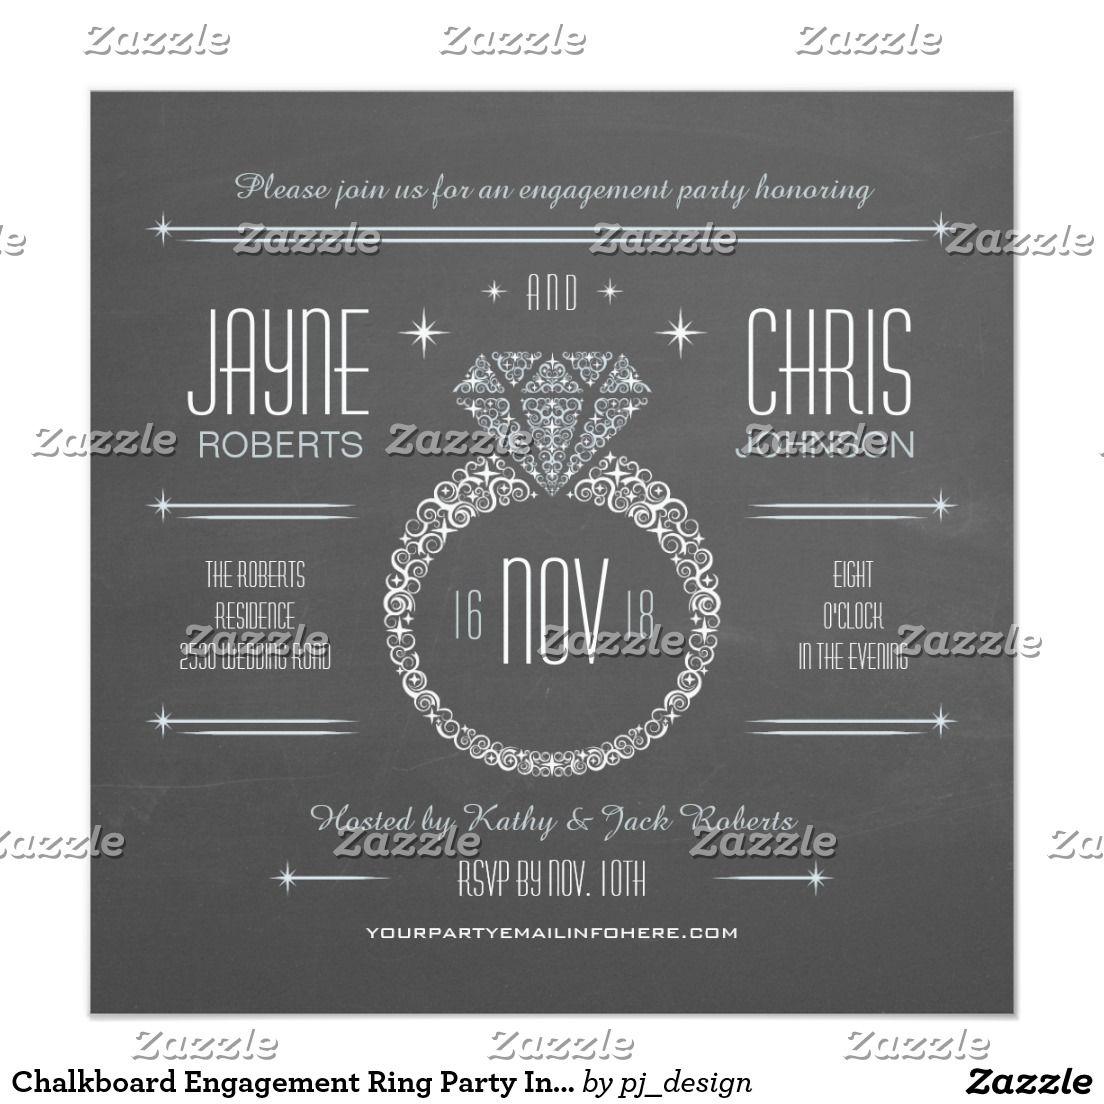 Chalkboard Engagement Ring Party Invitation   WEDDING: ENGAGEMENT ...